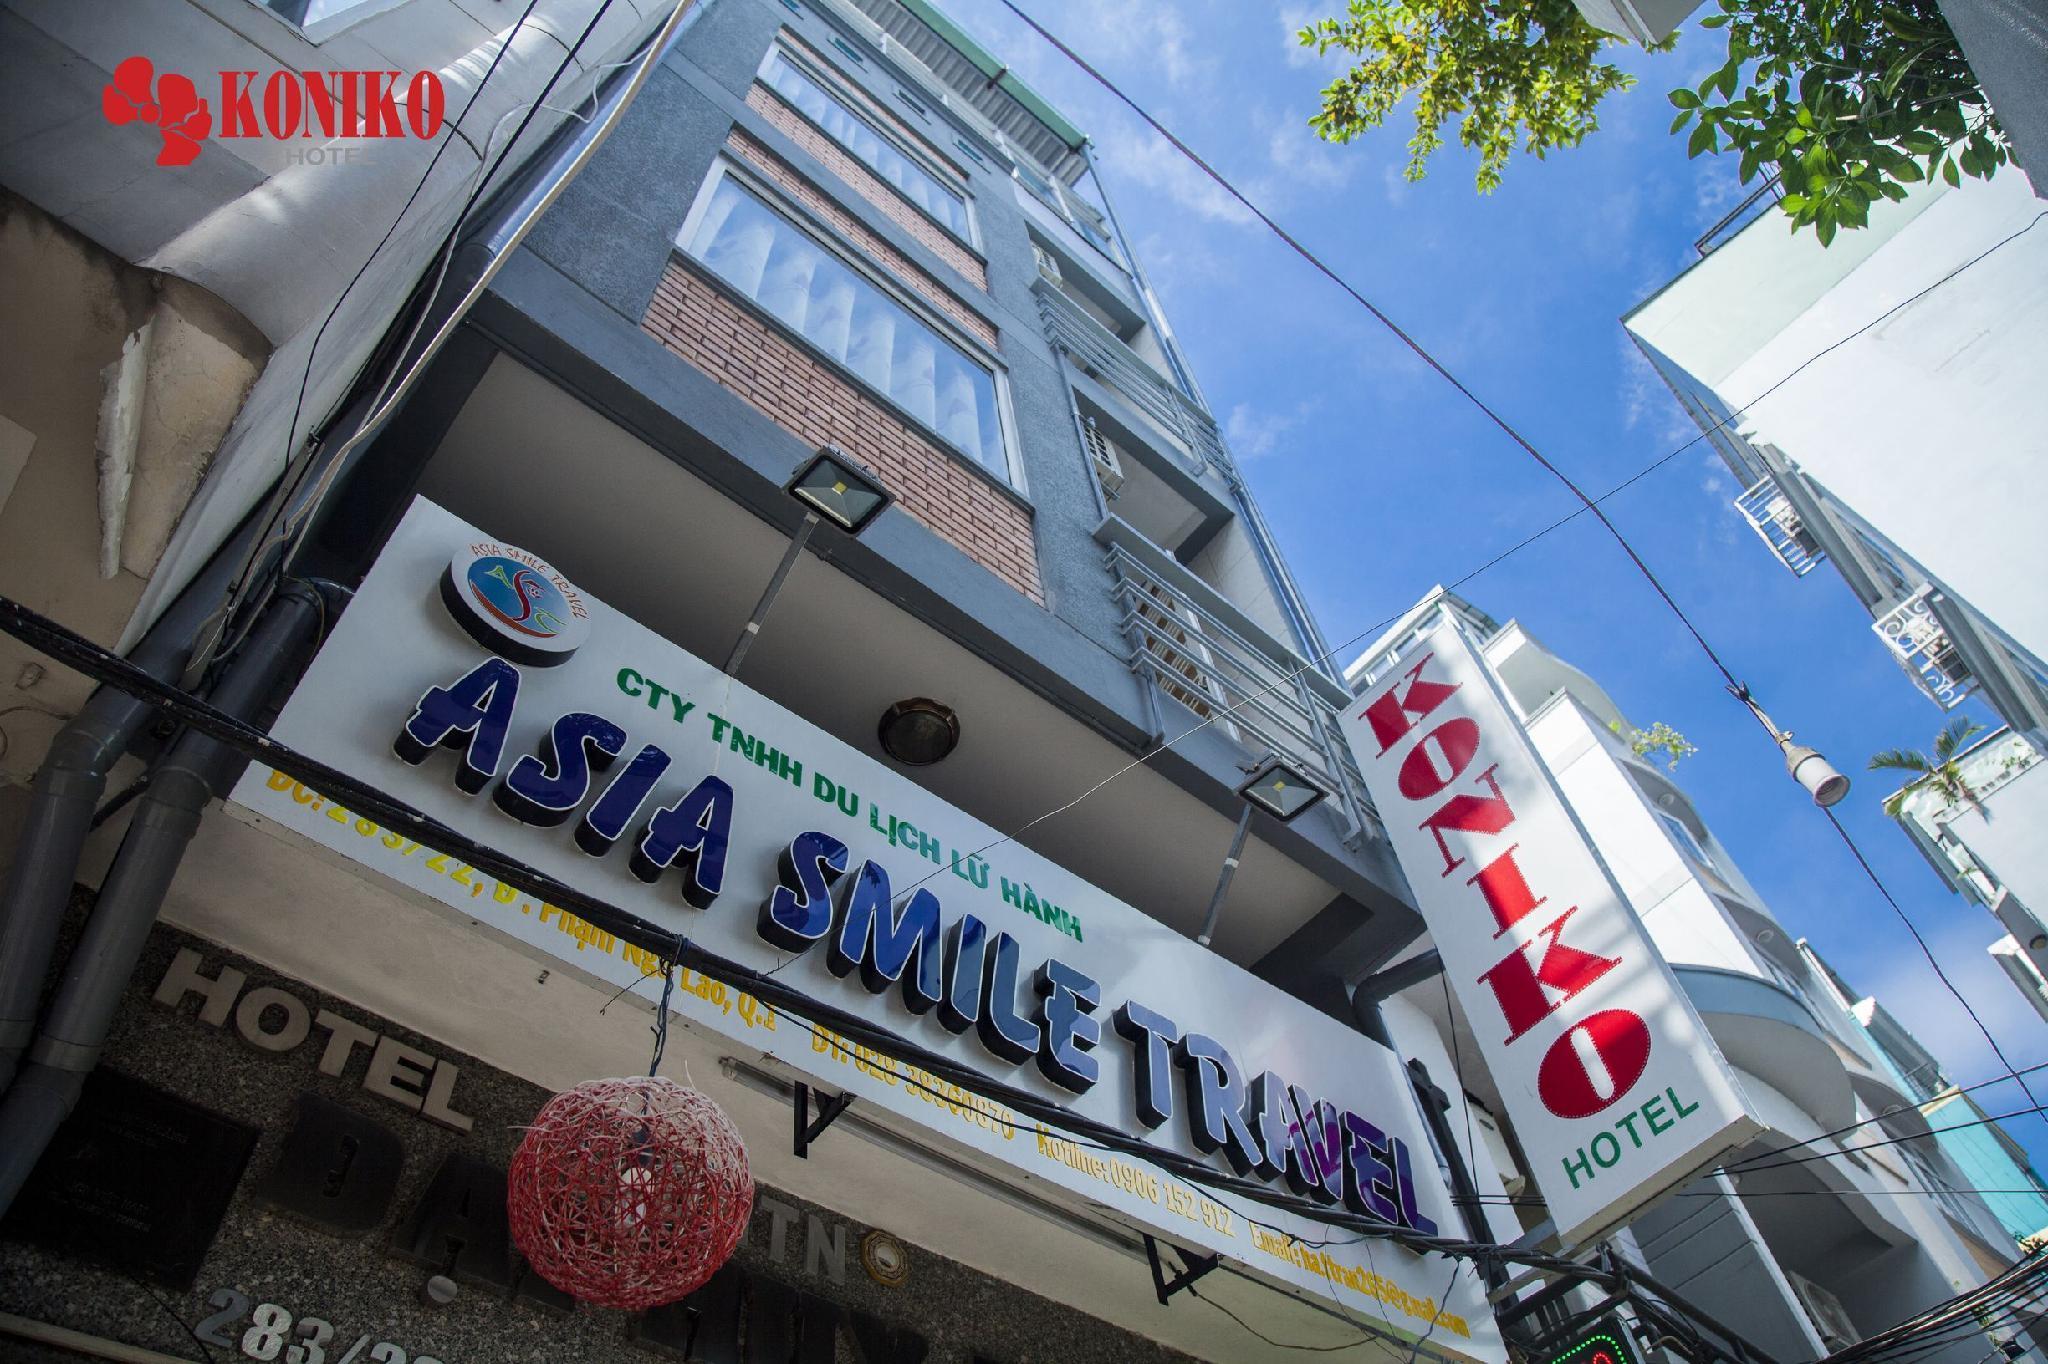 Koniko Hotel